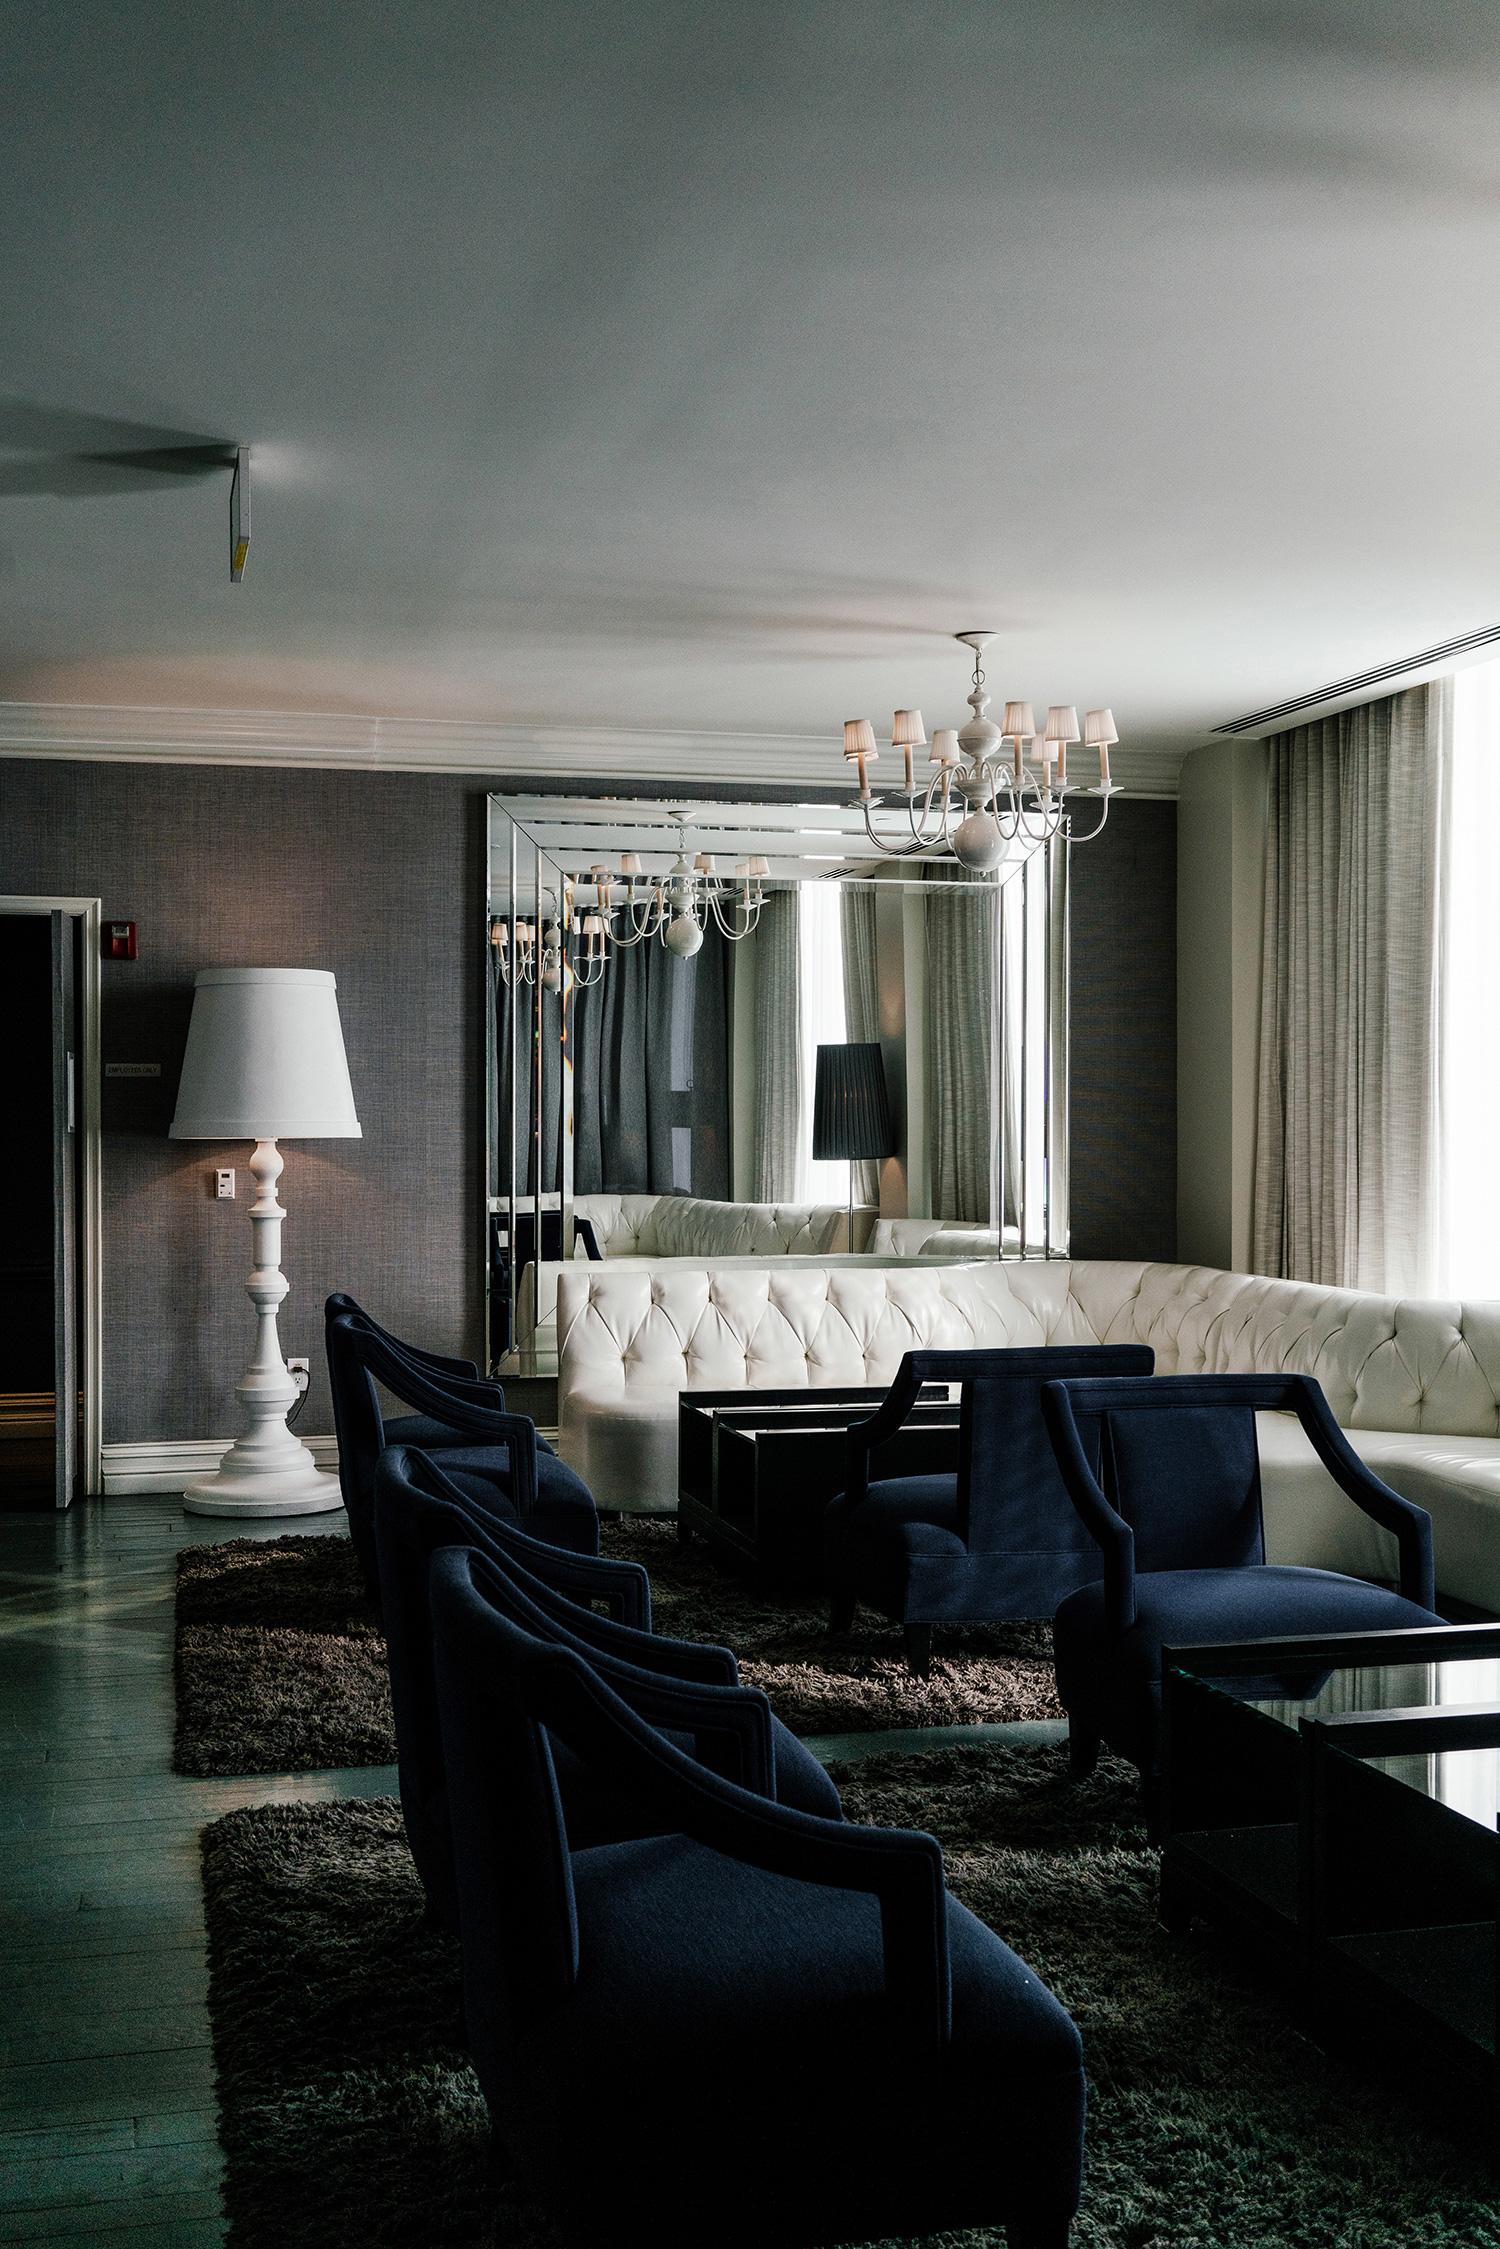 Viceroy Santa Monica via Smith Hotels